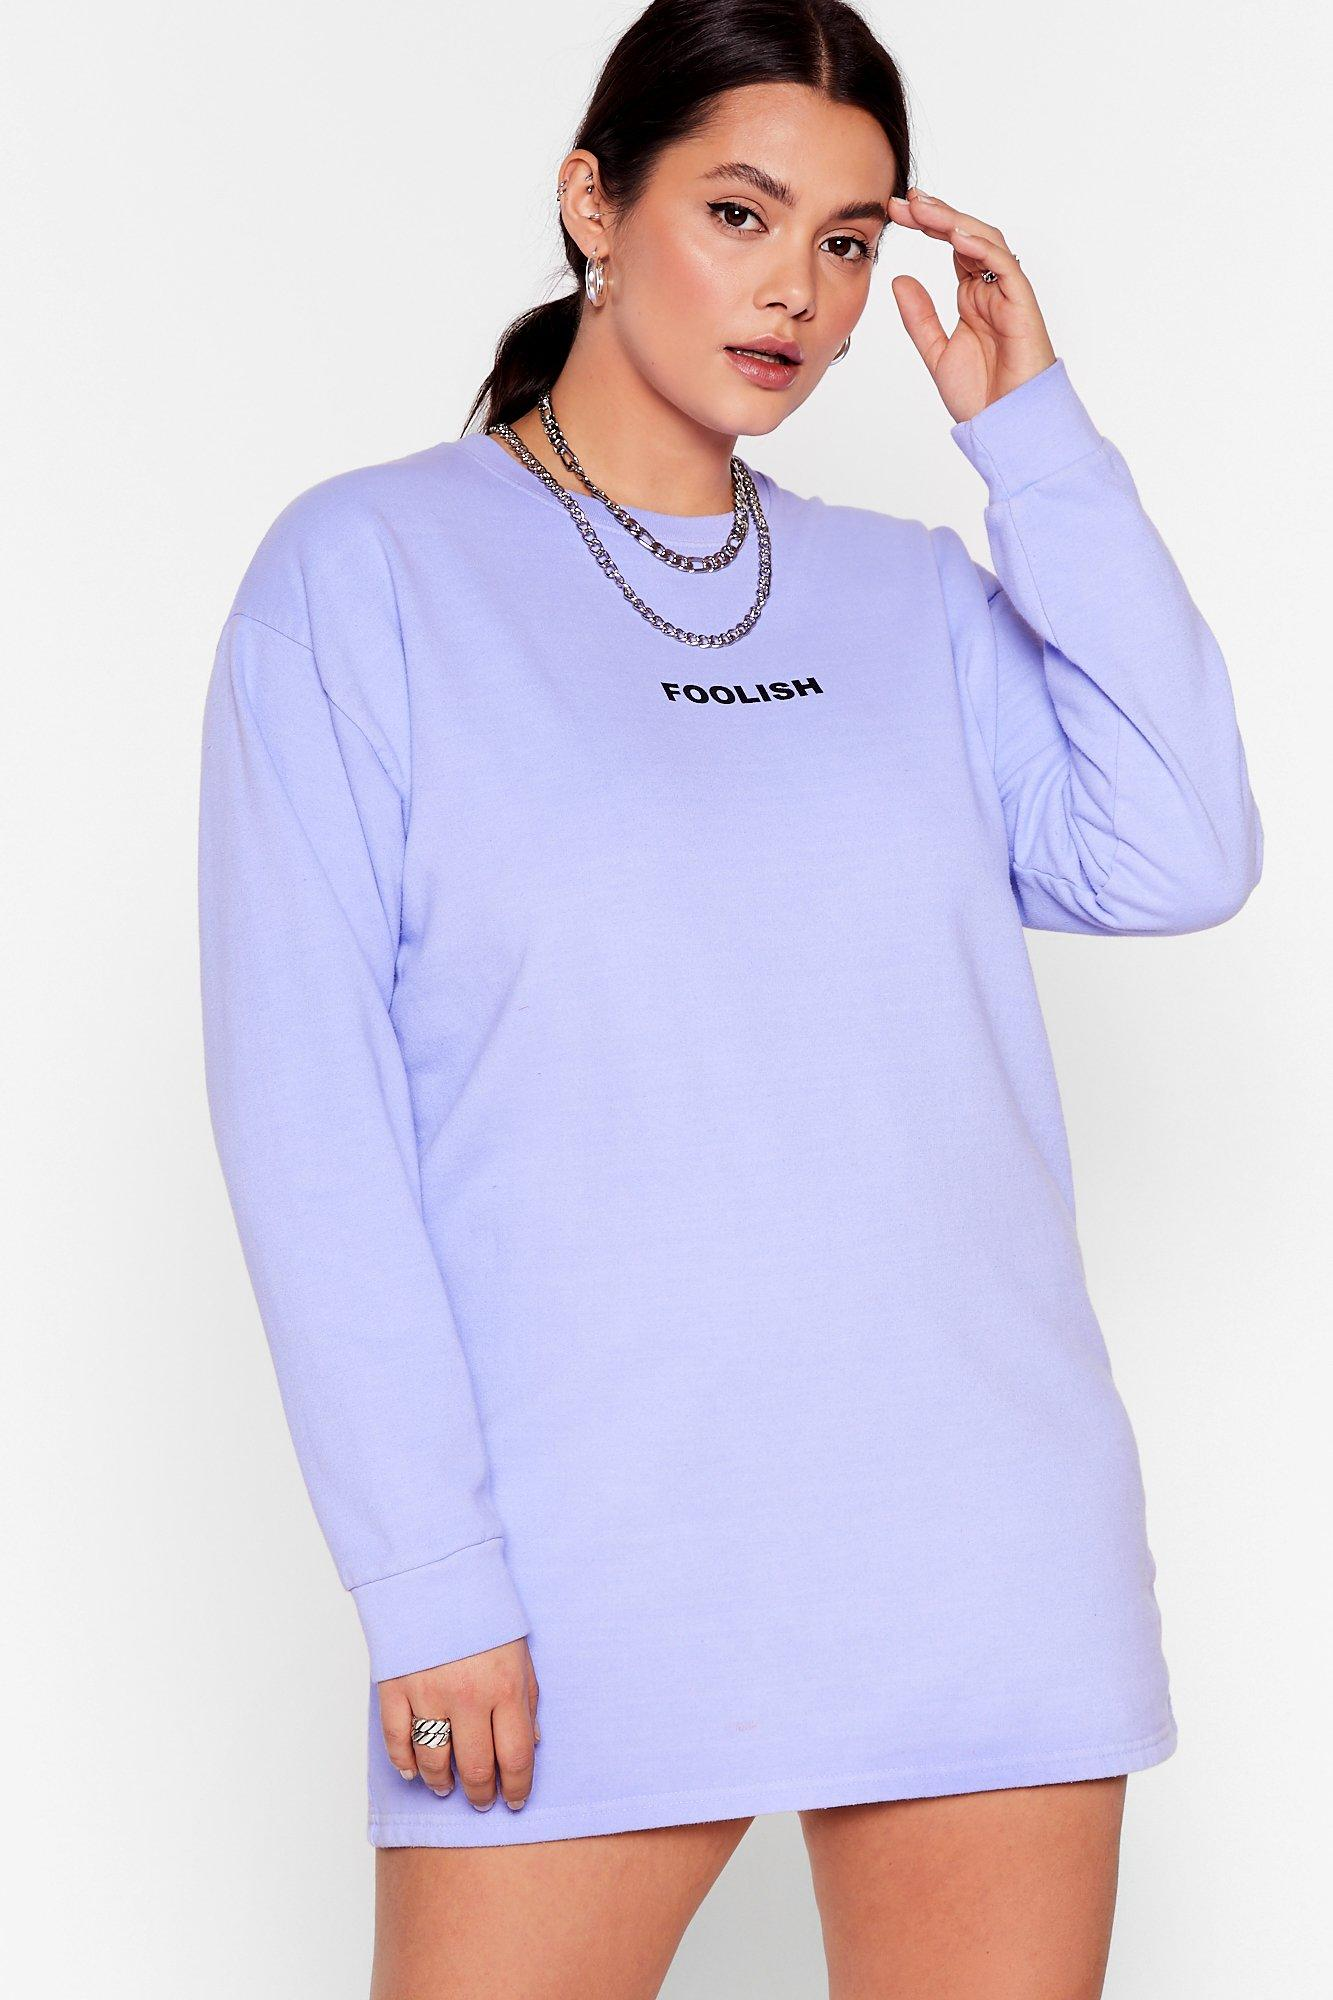 Don't Be Foolish Plus Sweatshirt Dress 7